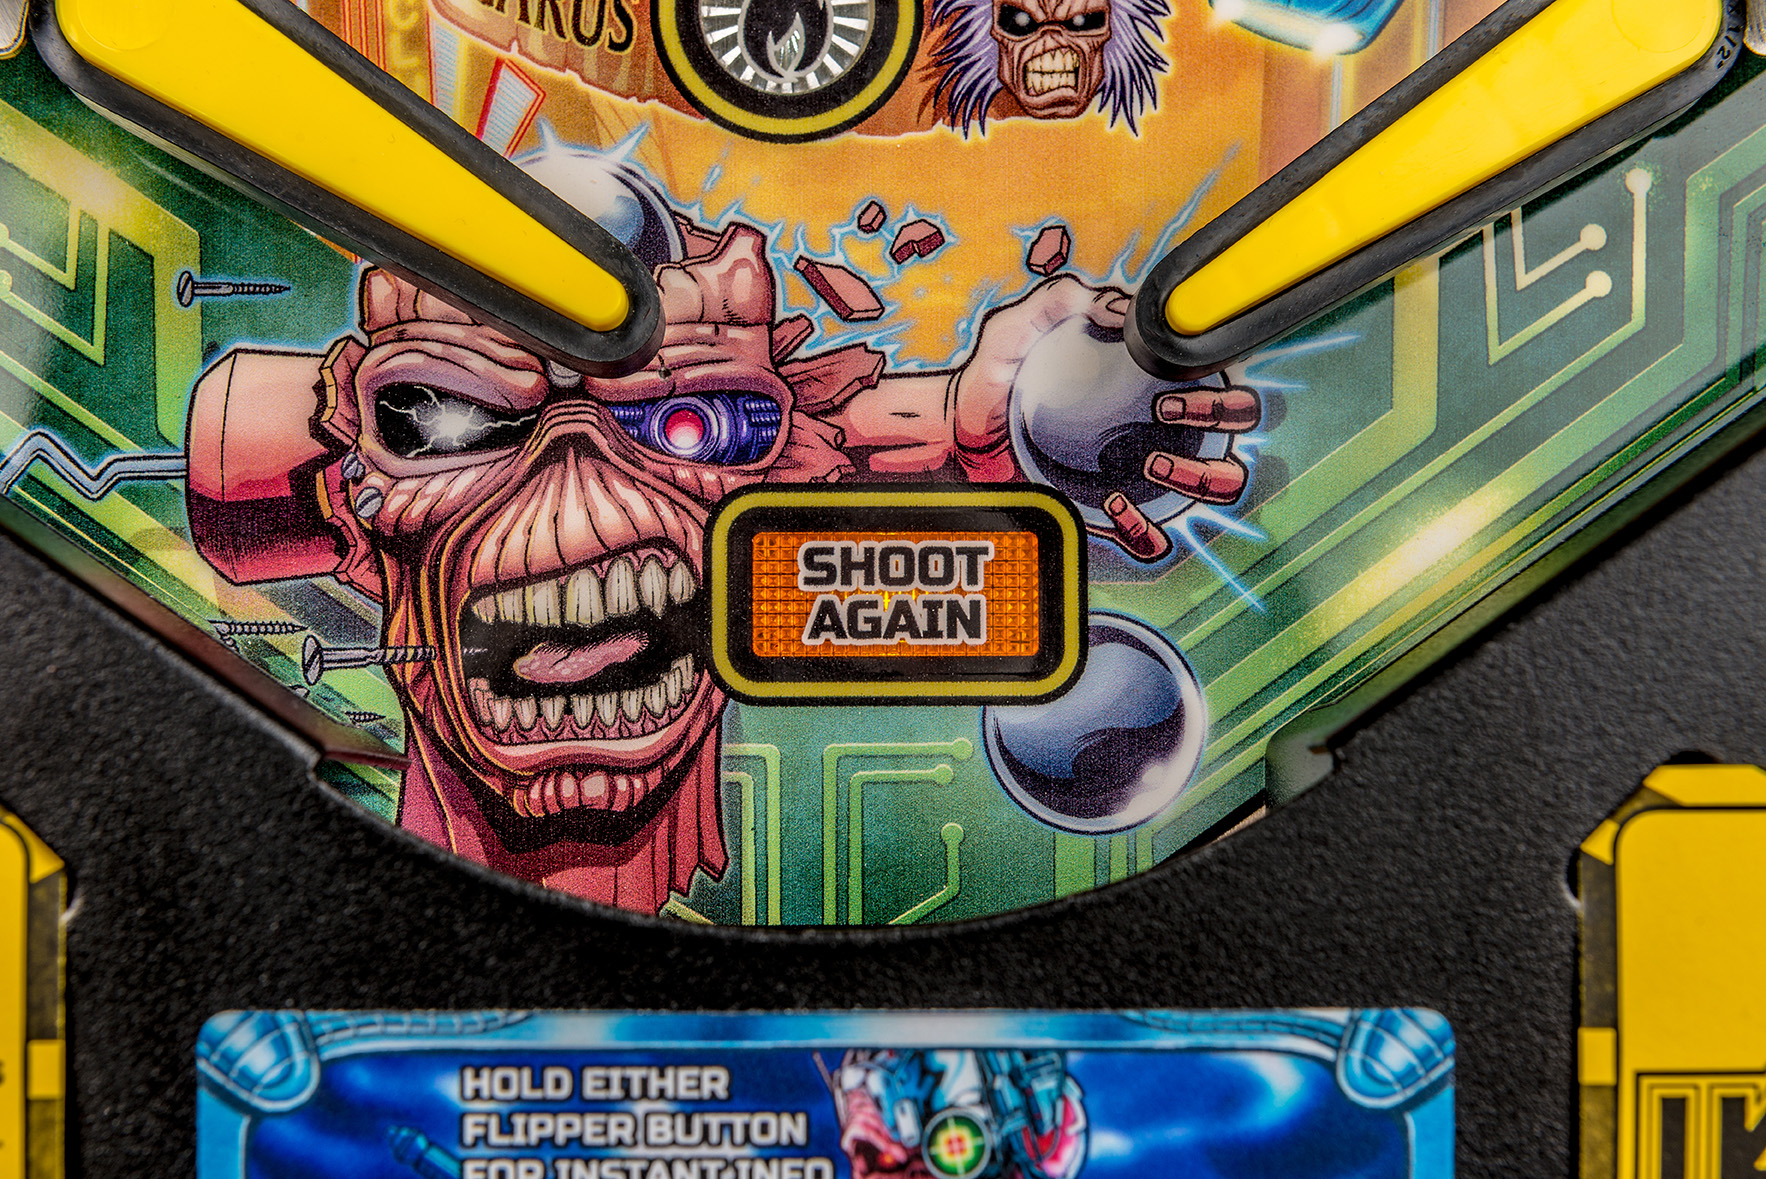 Iron-Maiden-Pinball-Machine-20a